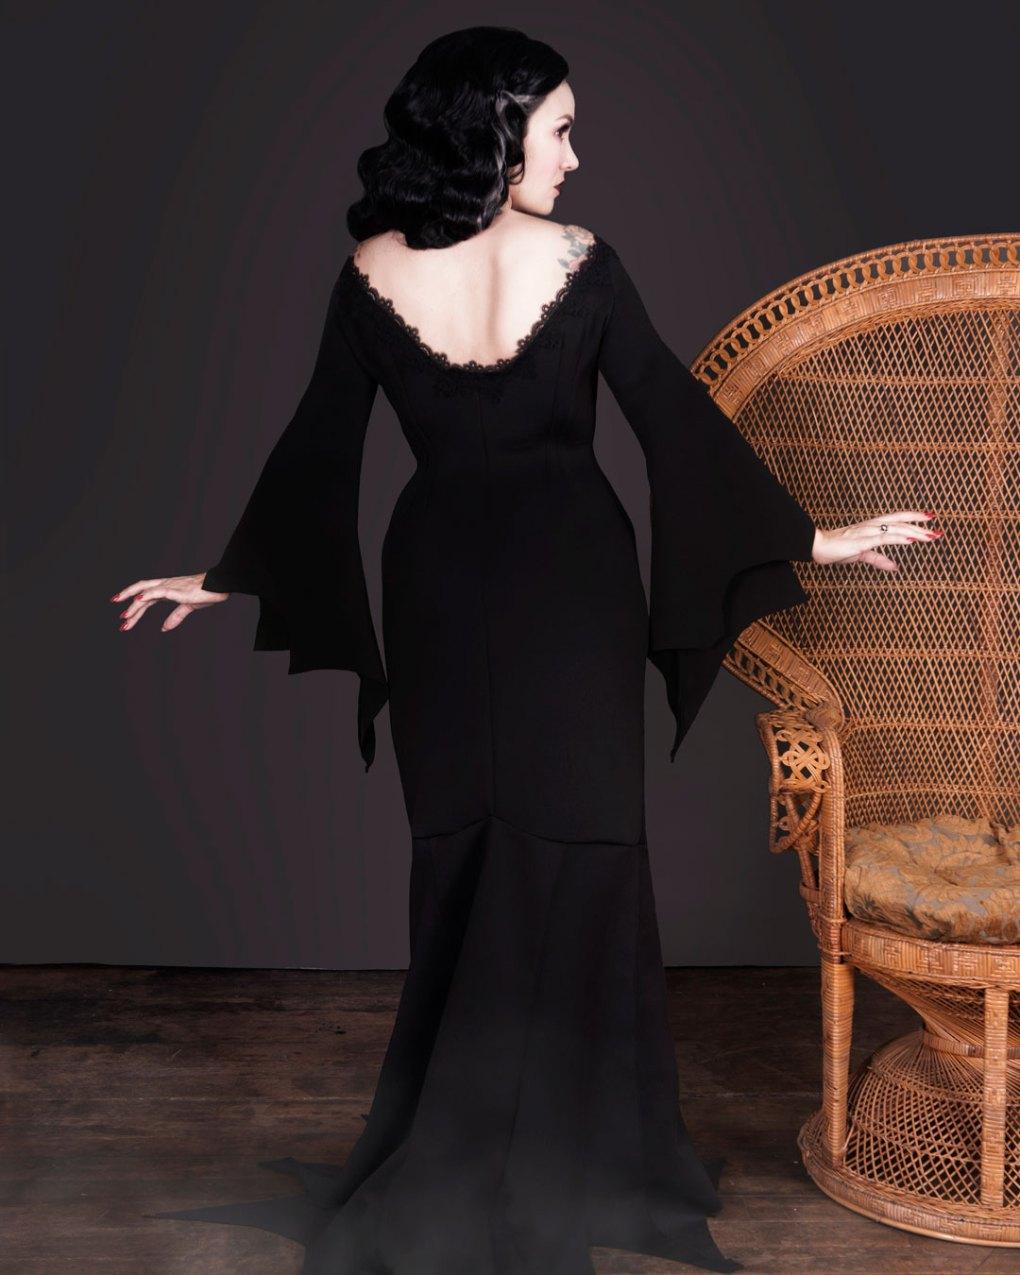 Morticia Addams inspired dress